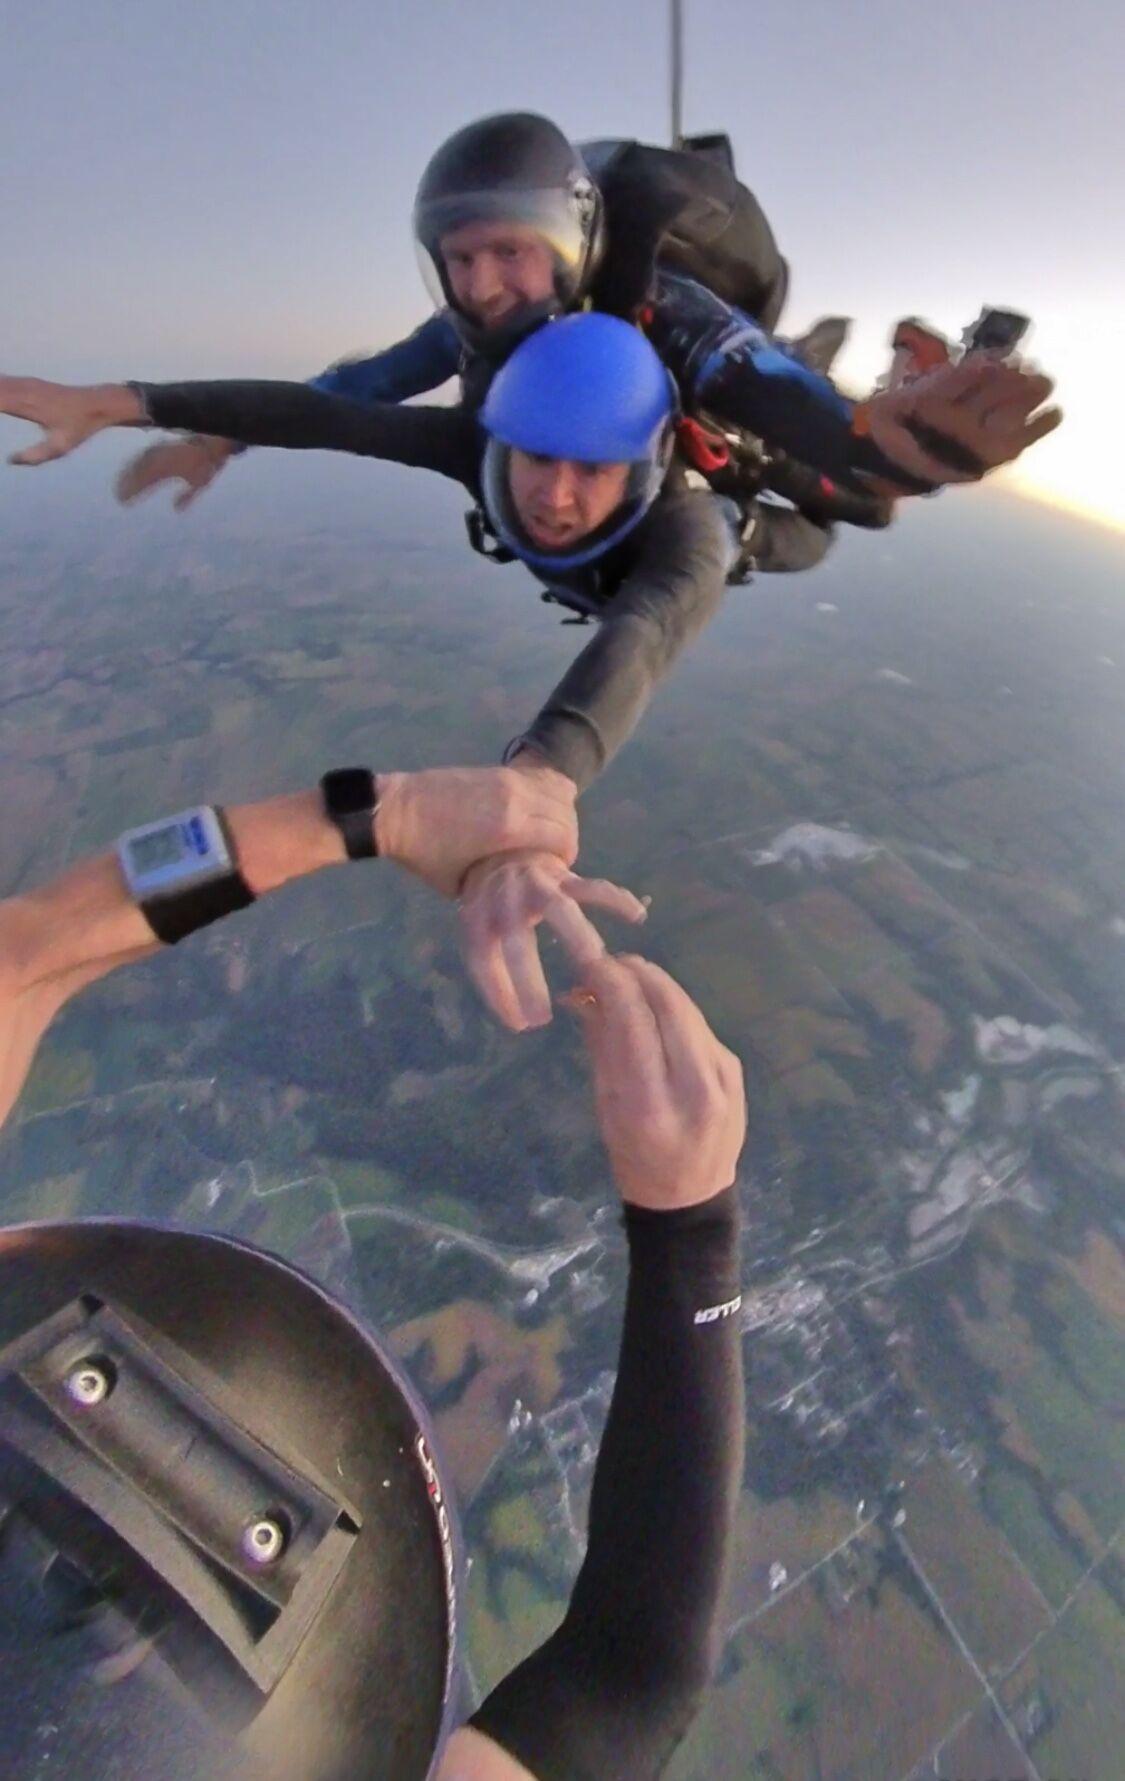 080121-owh-liv-skydivewedding-p1